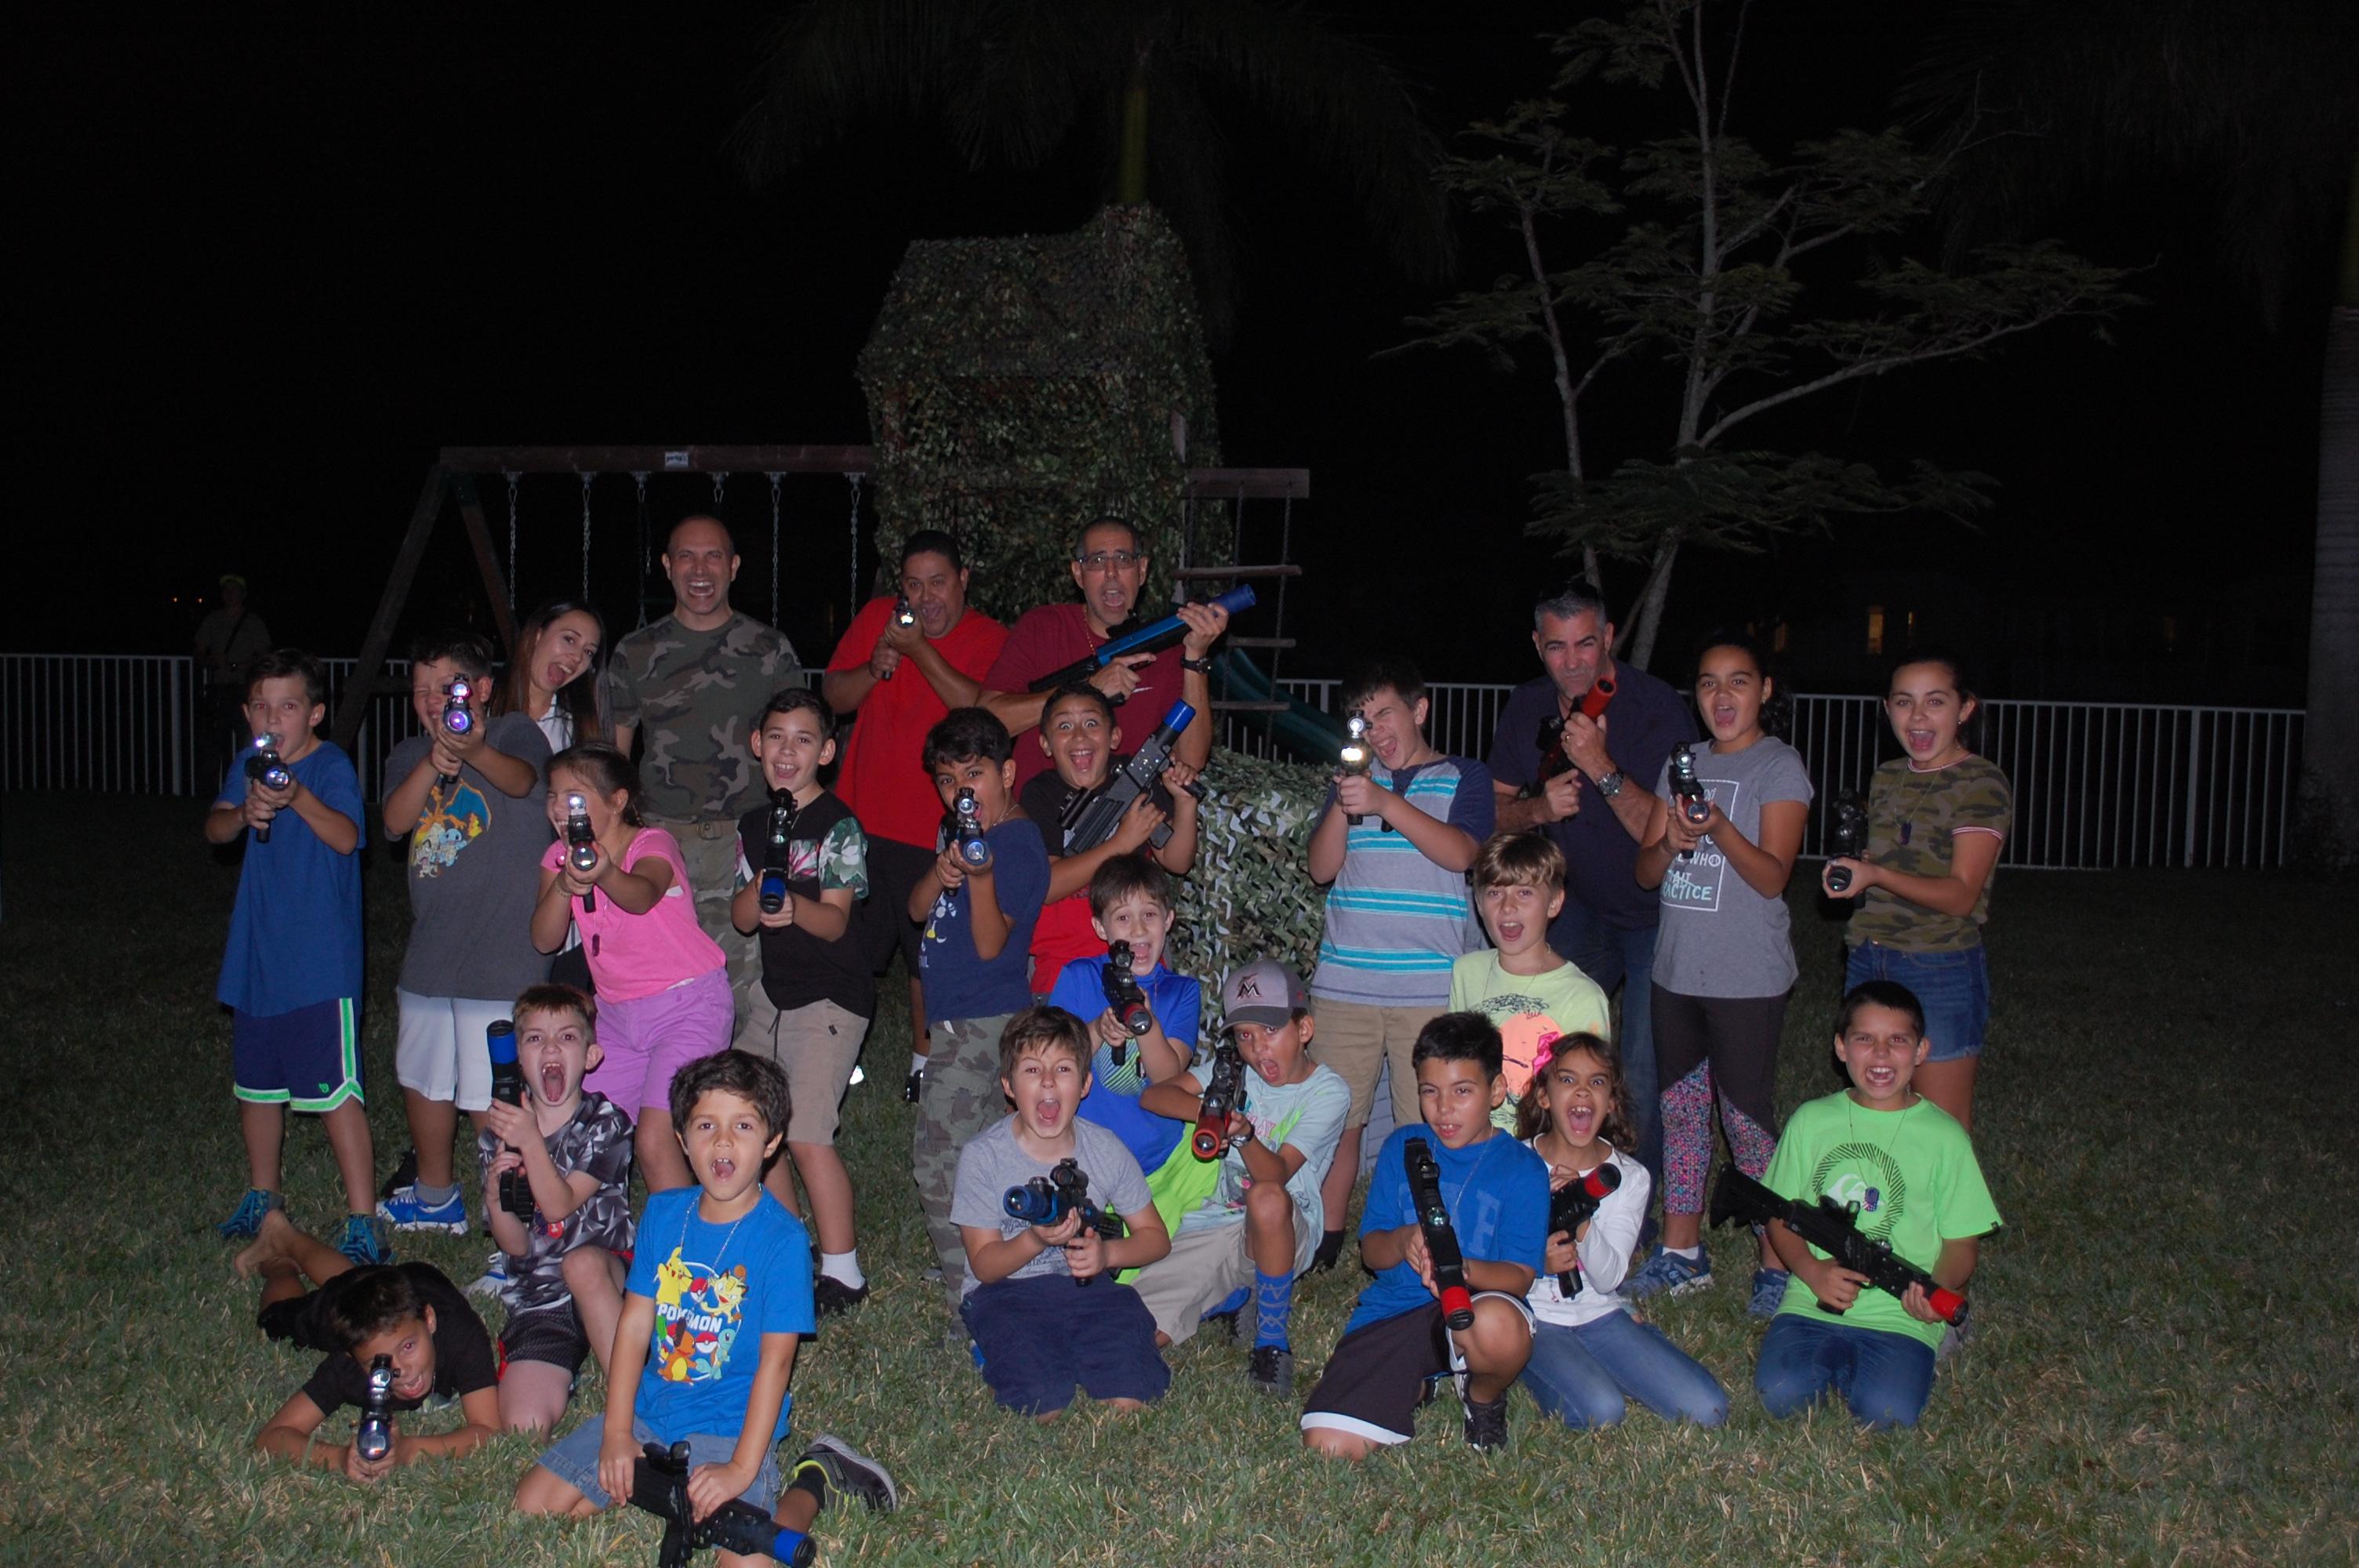 Best Birthday Party for 10yr old boy